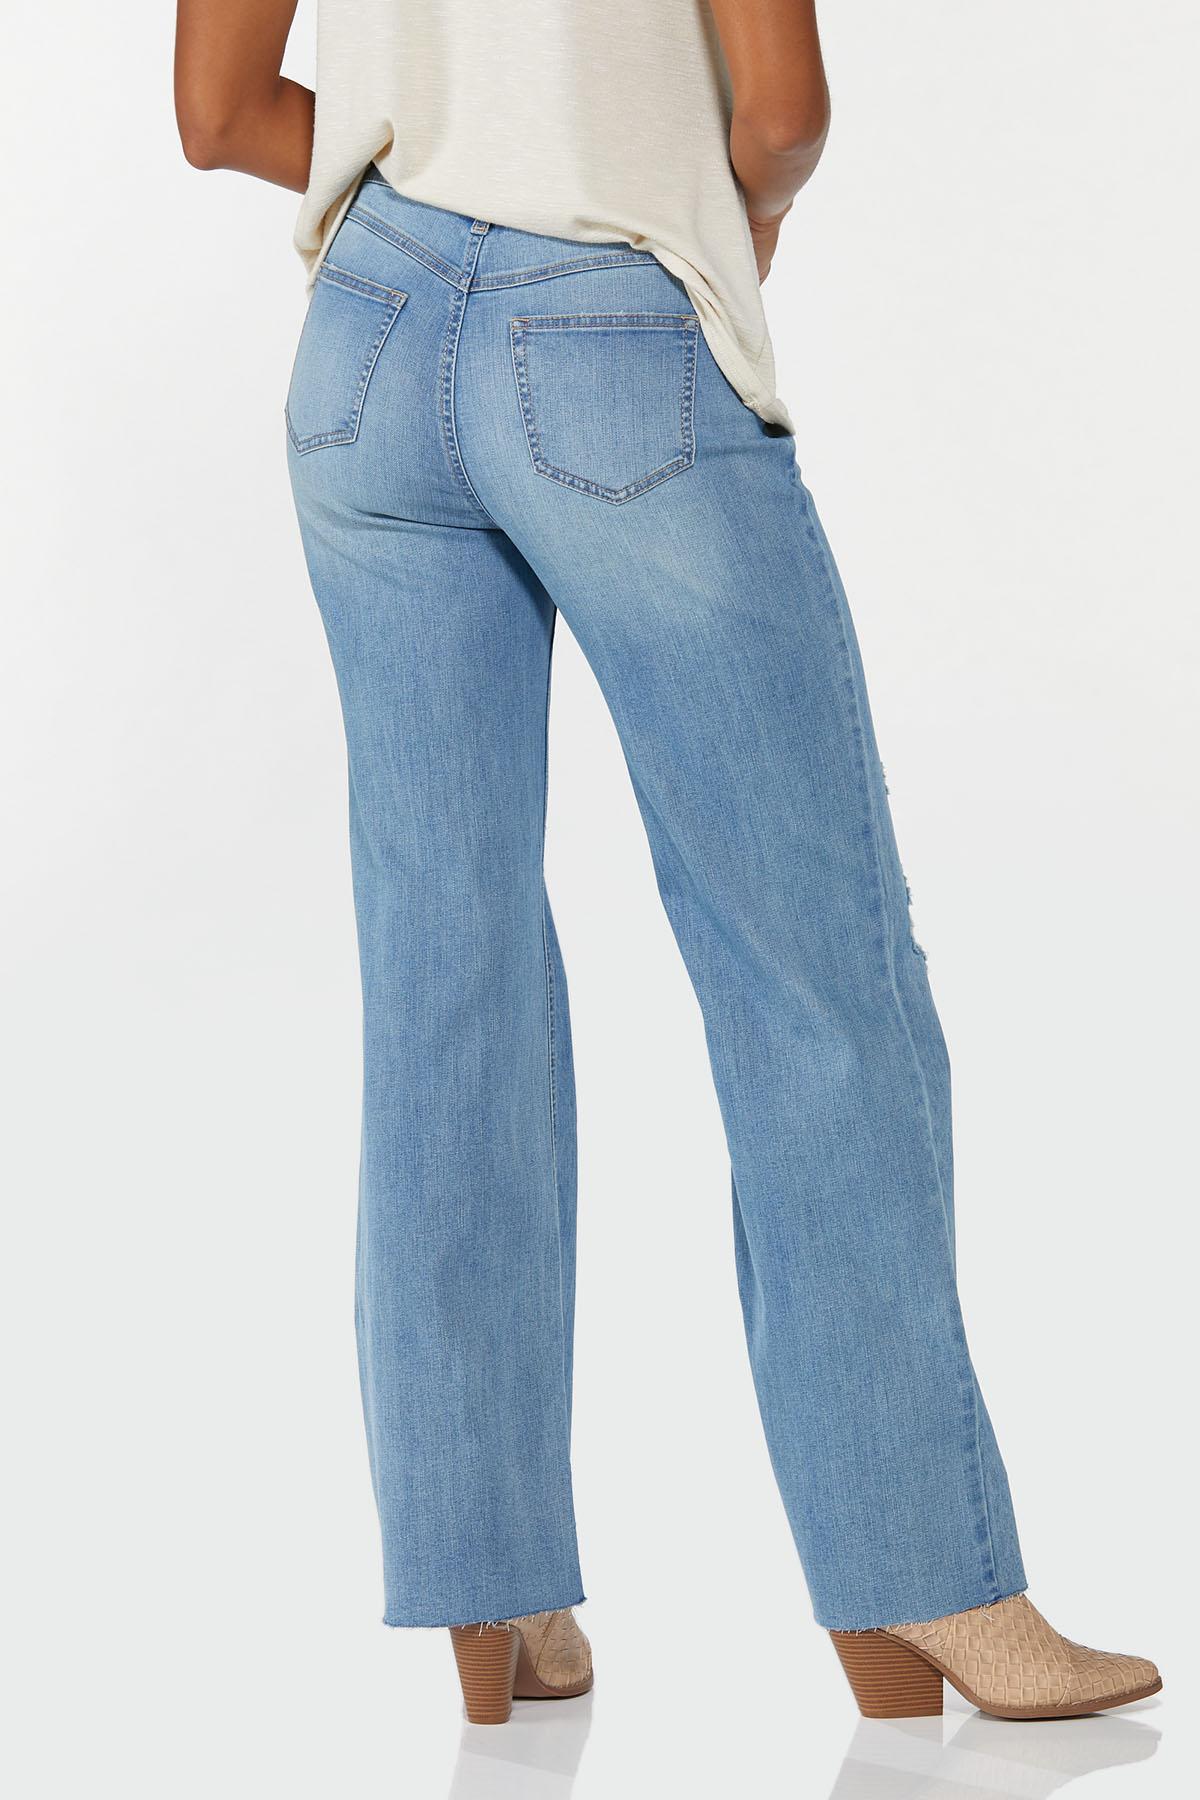 Distressed Wide Leg Jeans (Item #44698621)